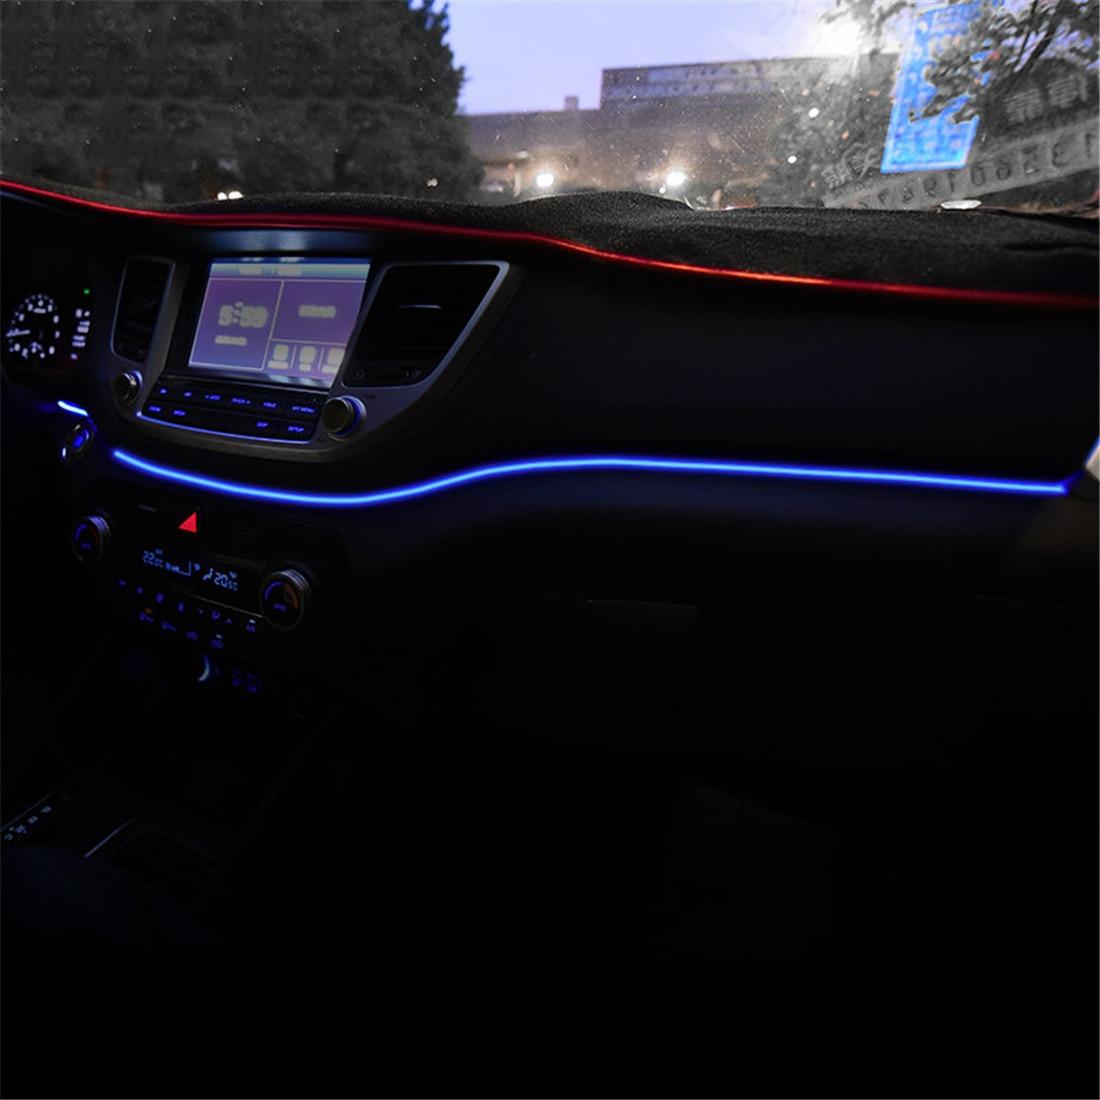 Instrument Panel Trim Atmosphere Light For Hyundai Tucson 2015 2016 Interior LED Blue Dashboard Frame Light For Tucson 2017 2018